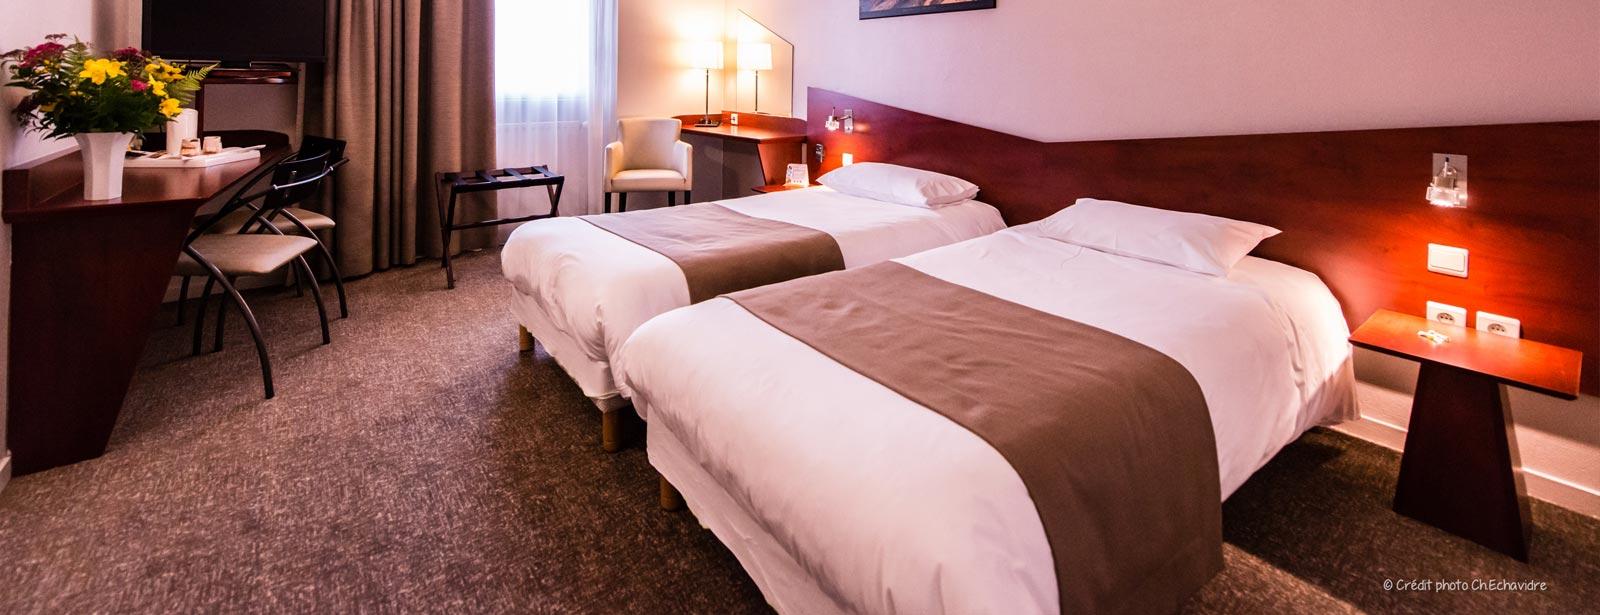 chambre supérieure 2 lits simples